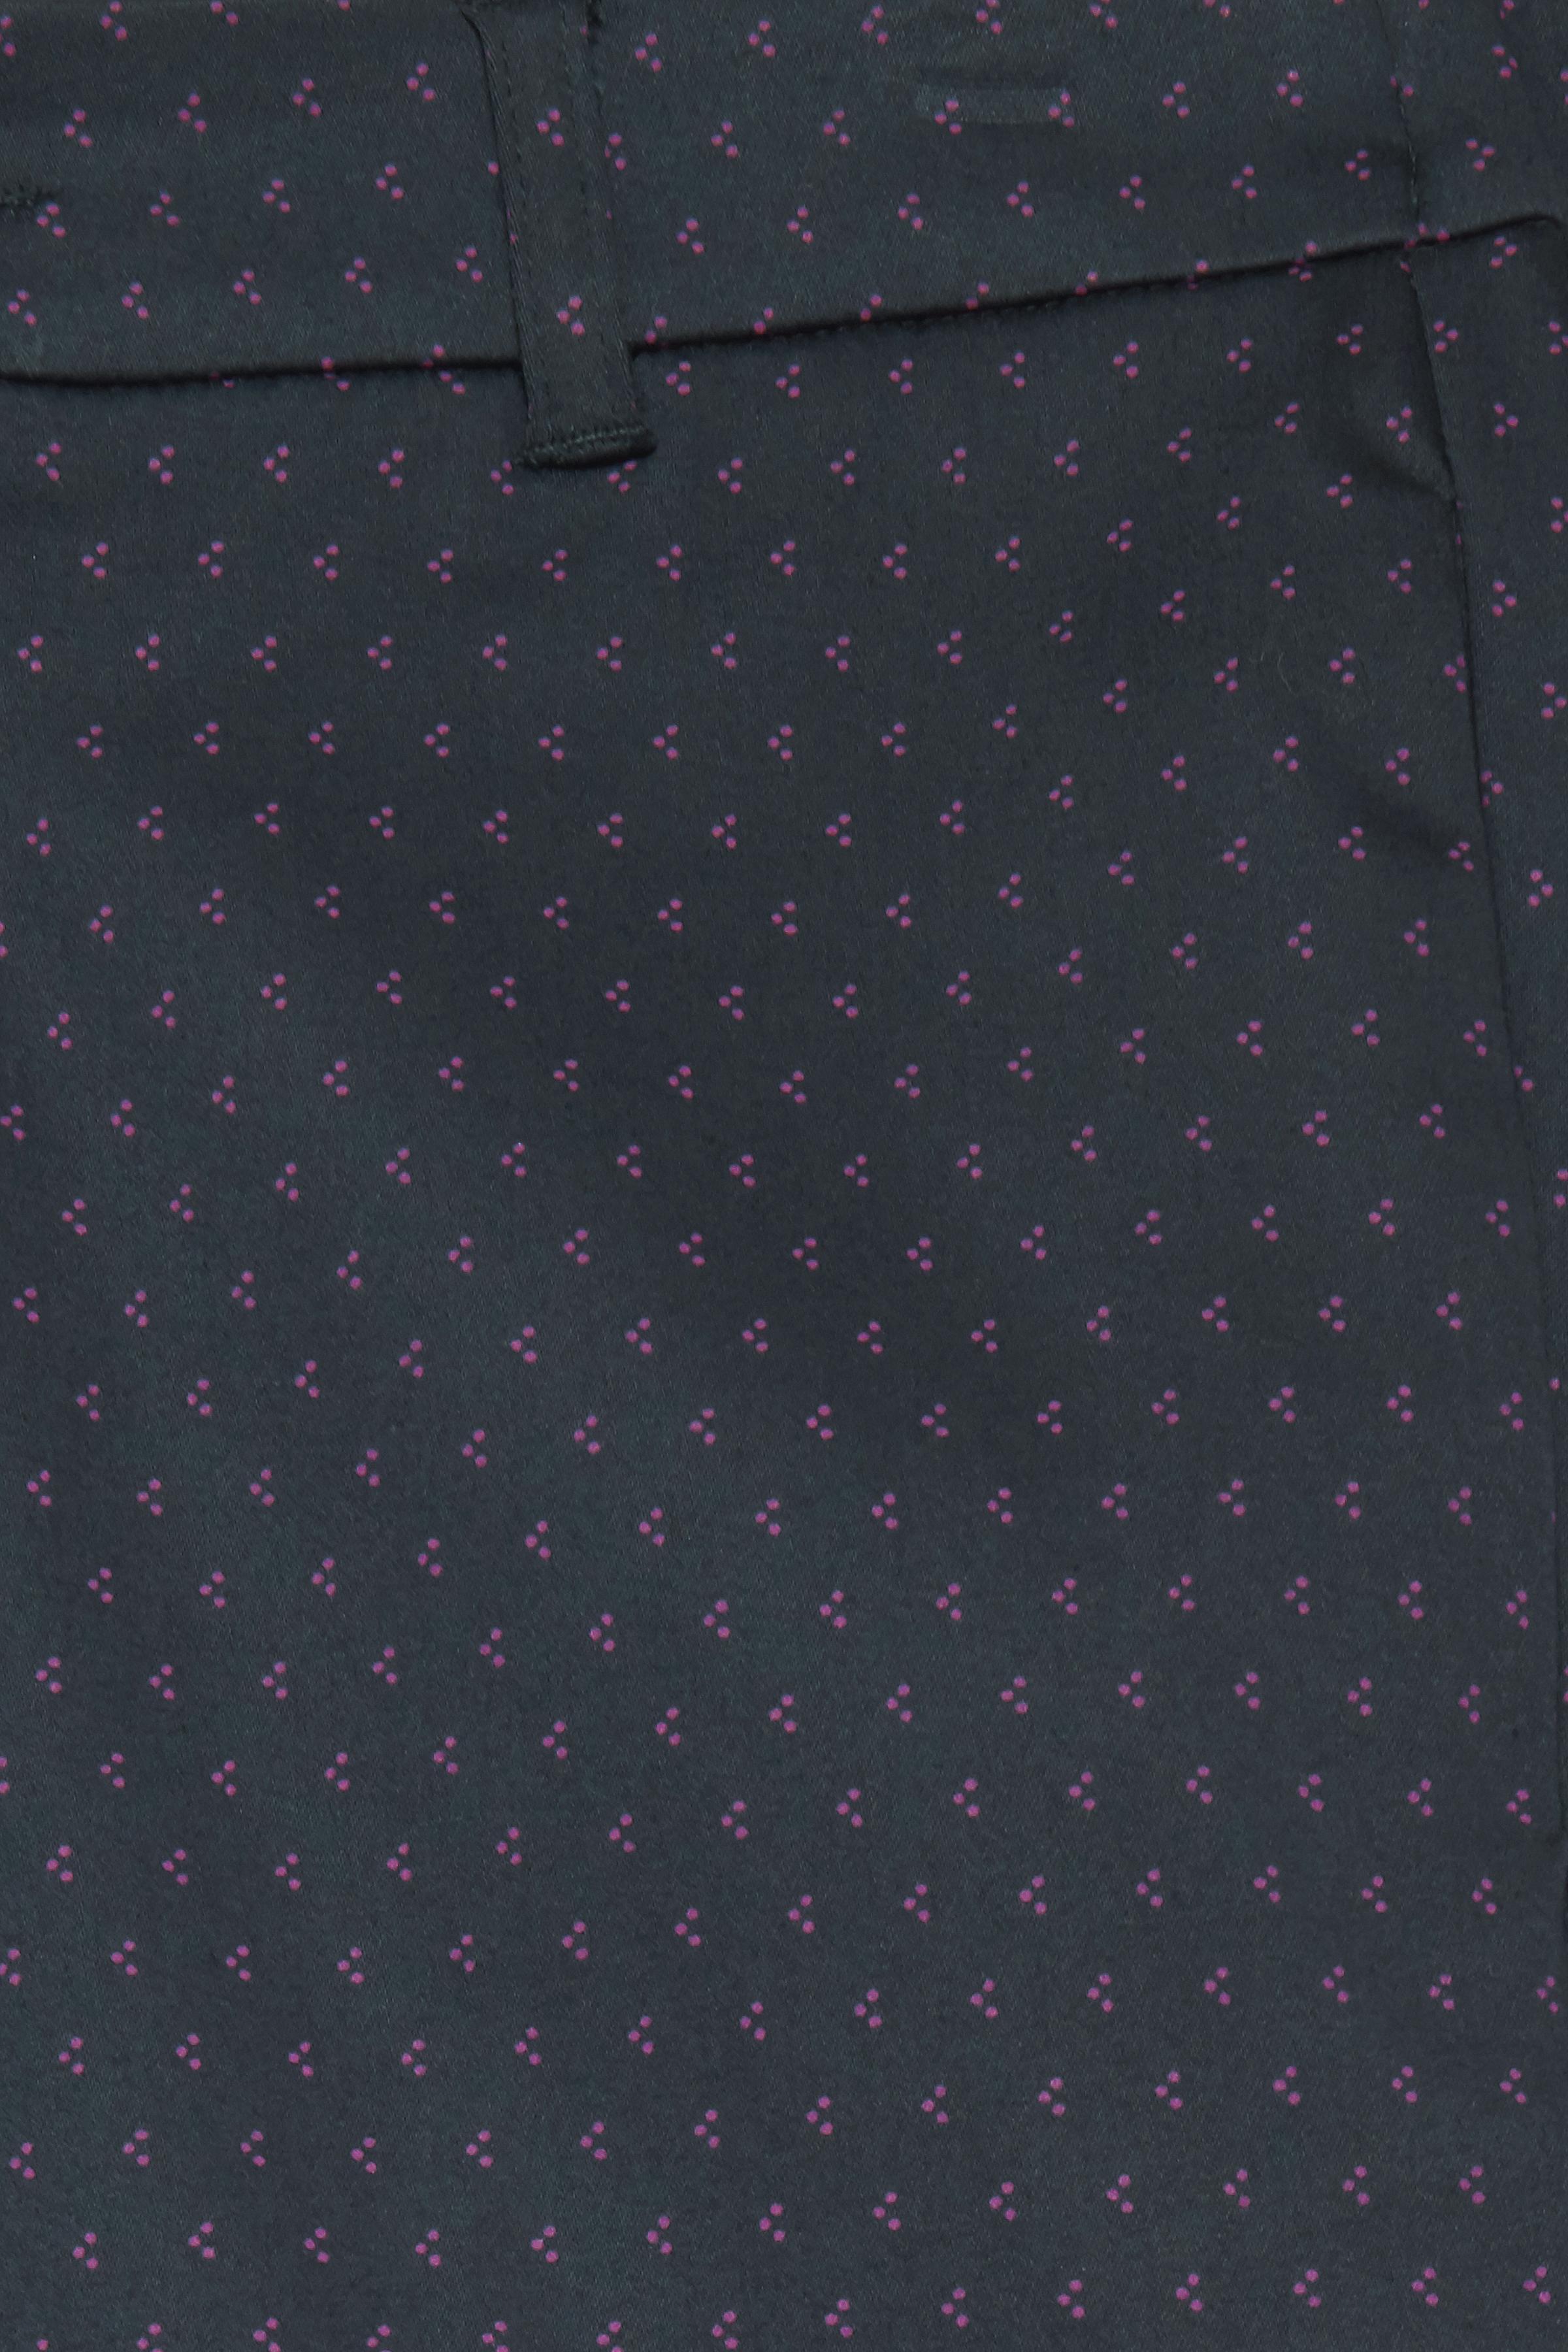 Marineblau/pink Casual Hose von Dranella – Shoppen Sie Marineblau/pink Casual Hose ab Gr. 32-46 hier